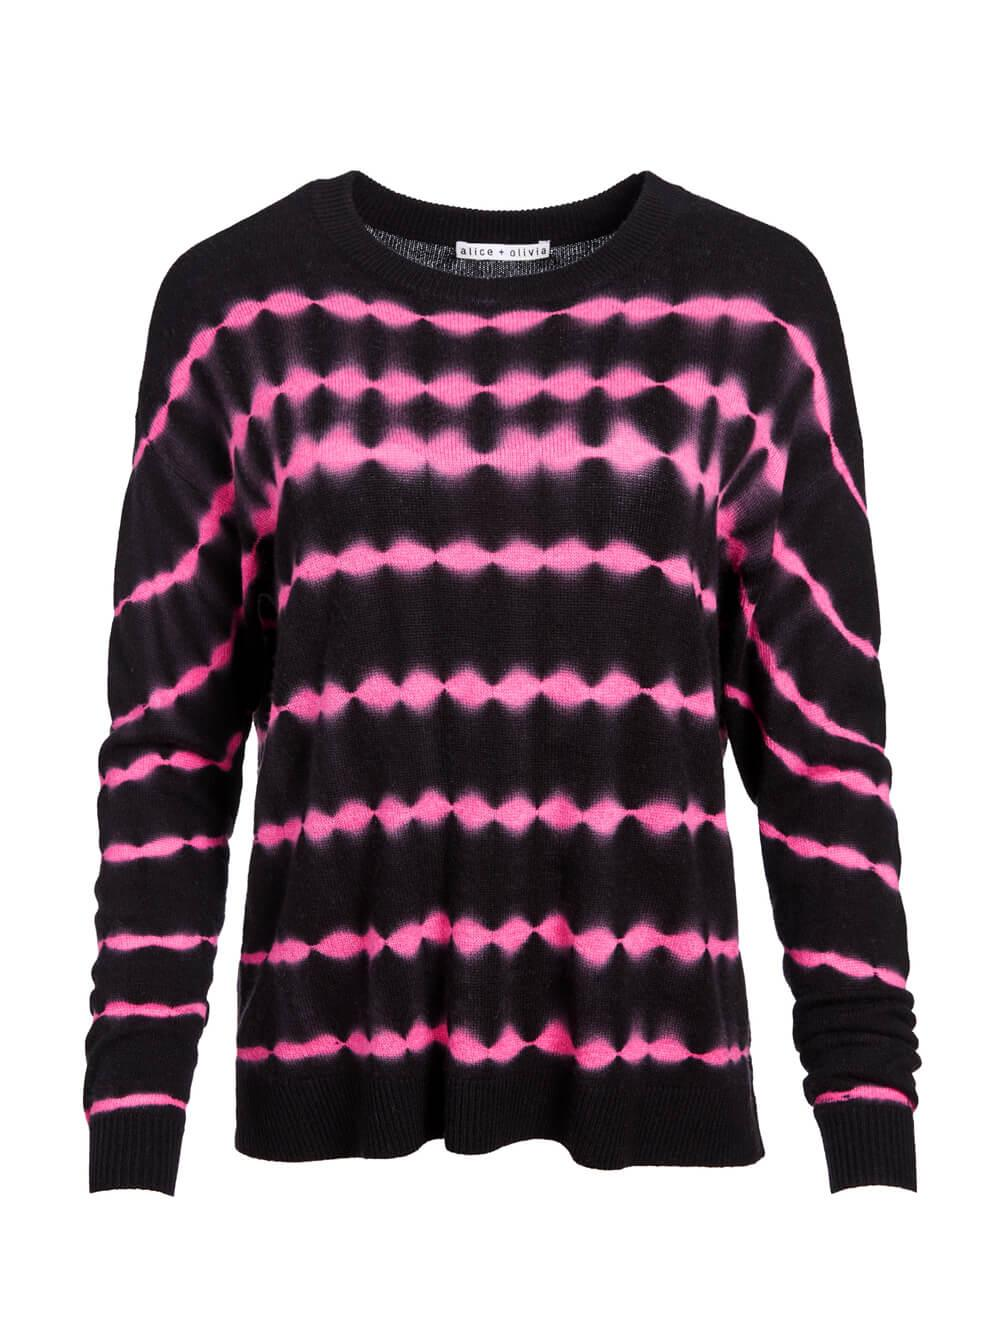 Gleeson Tie Dye Sweater Item # CC102529705